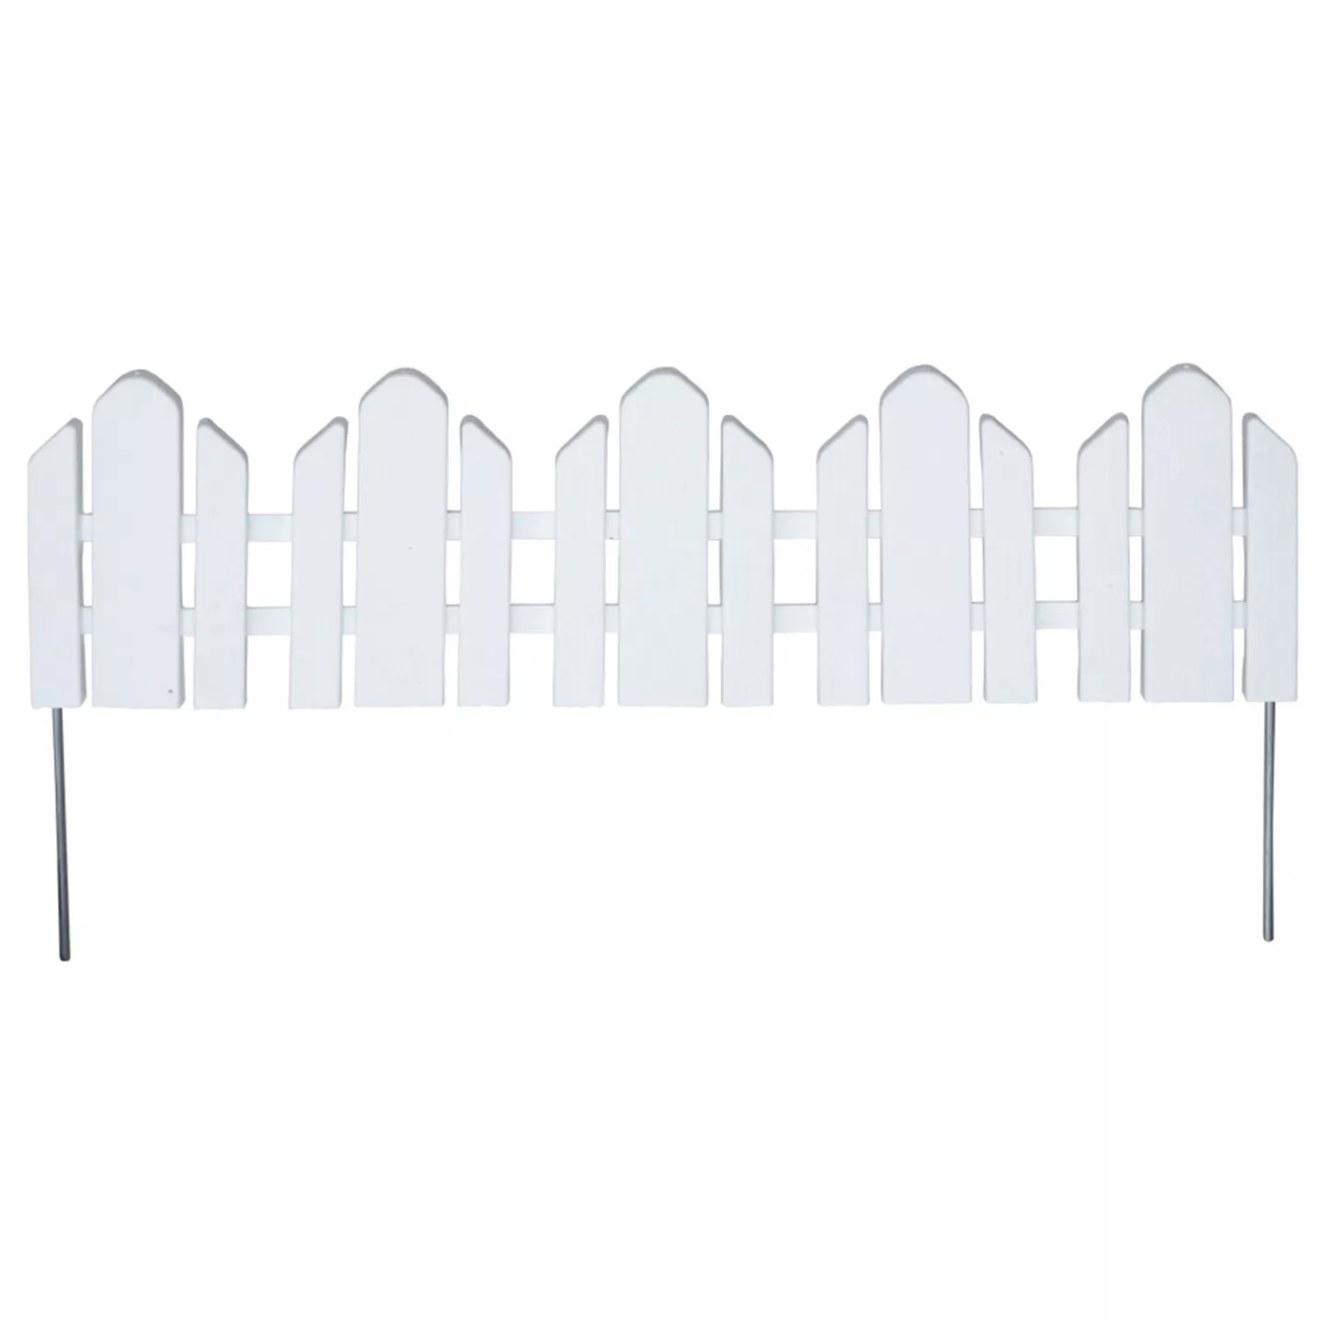 The white fence border